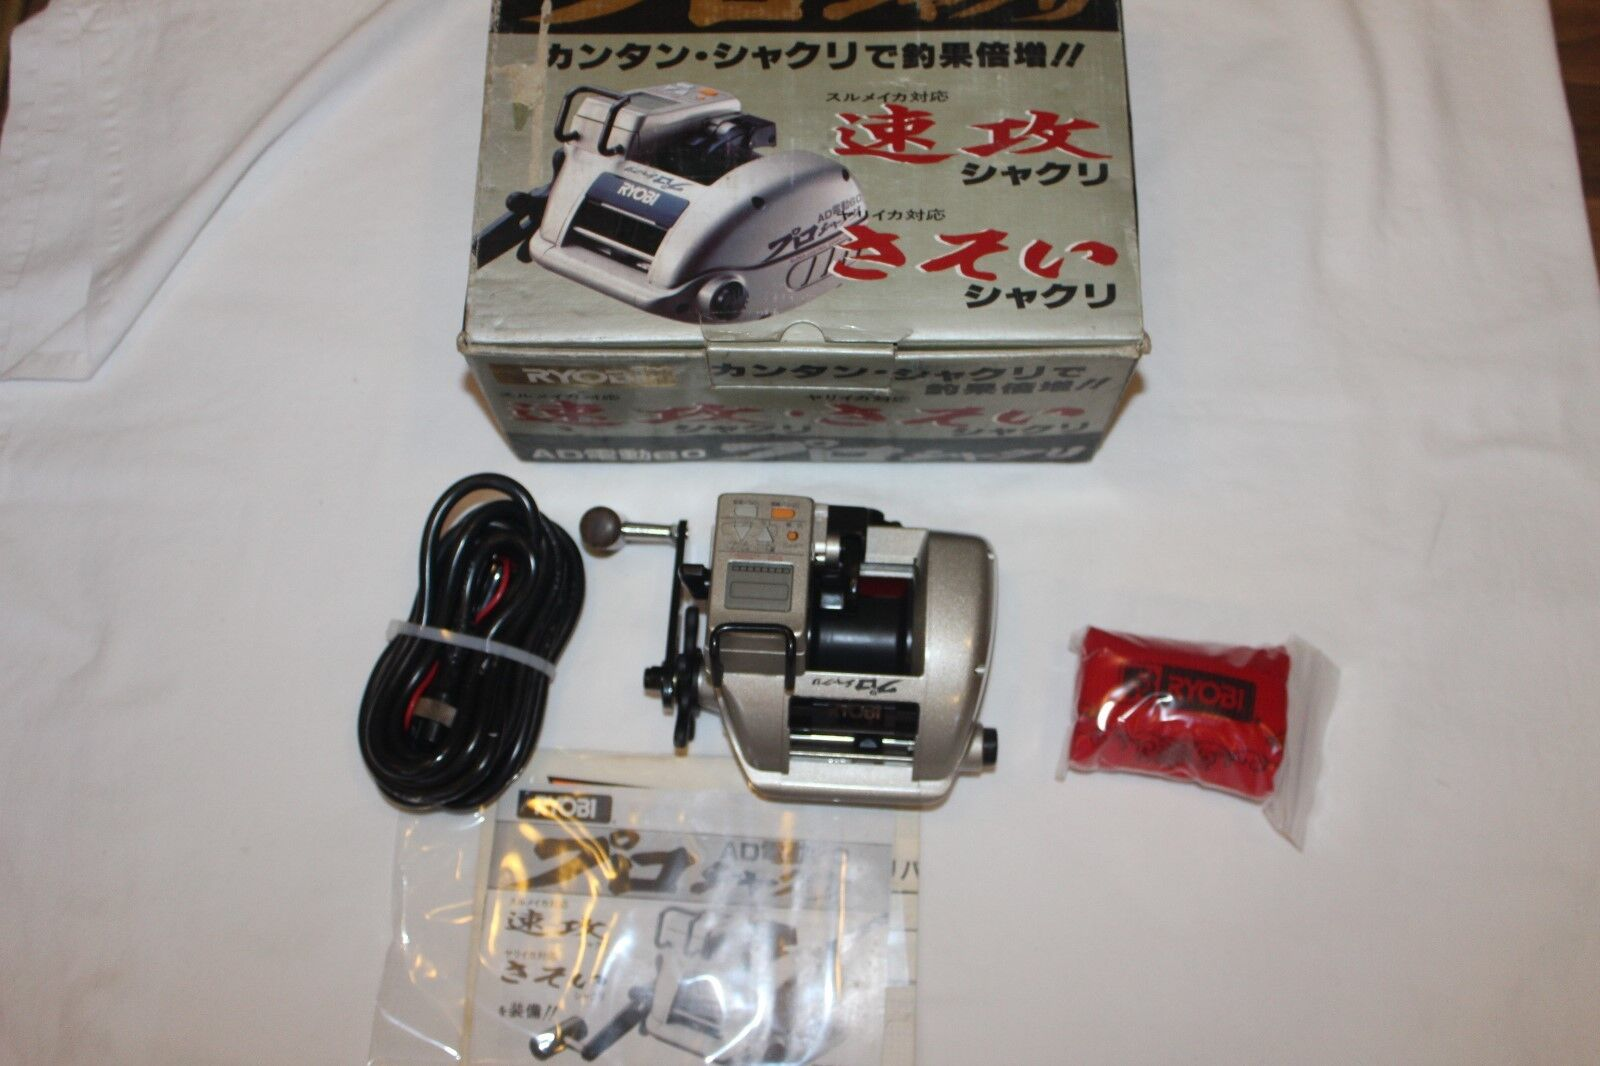 RYOBI ADVENTURE AD  60 -PRO JIGGING-ELEKTRgoldLLE-MADE IN JAPAN-Nr-884  free shipping on all orders